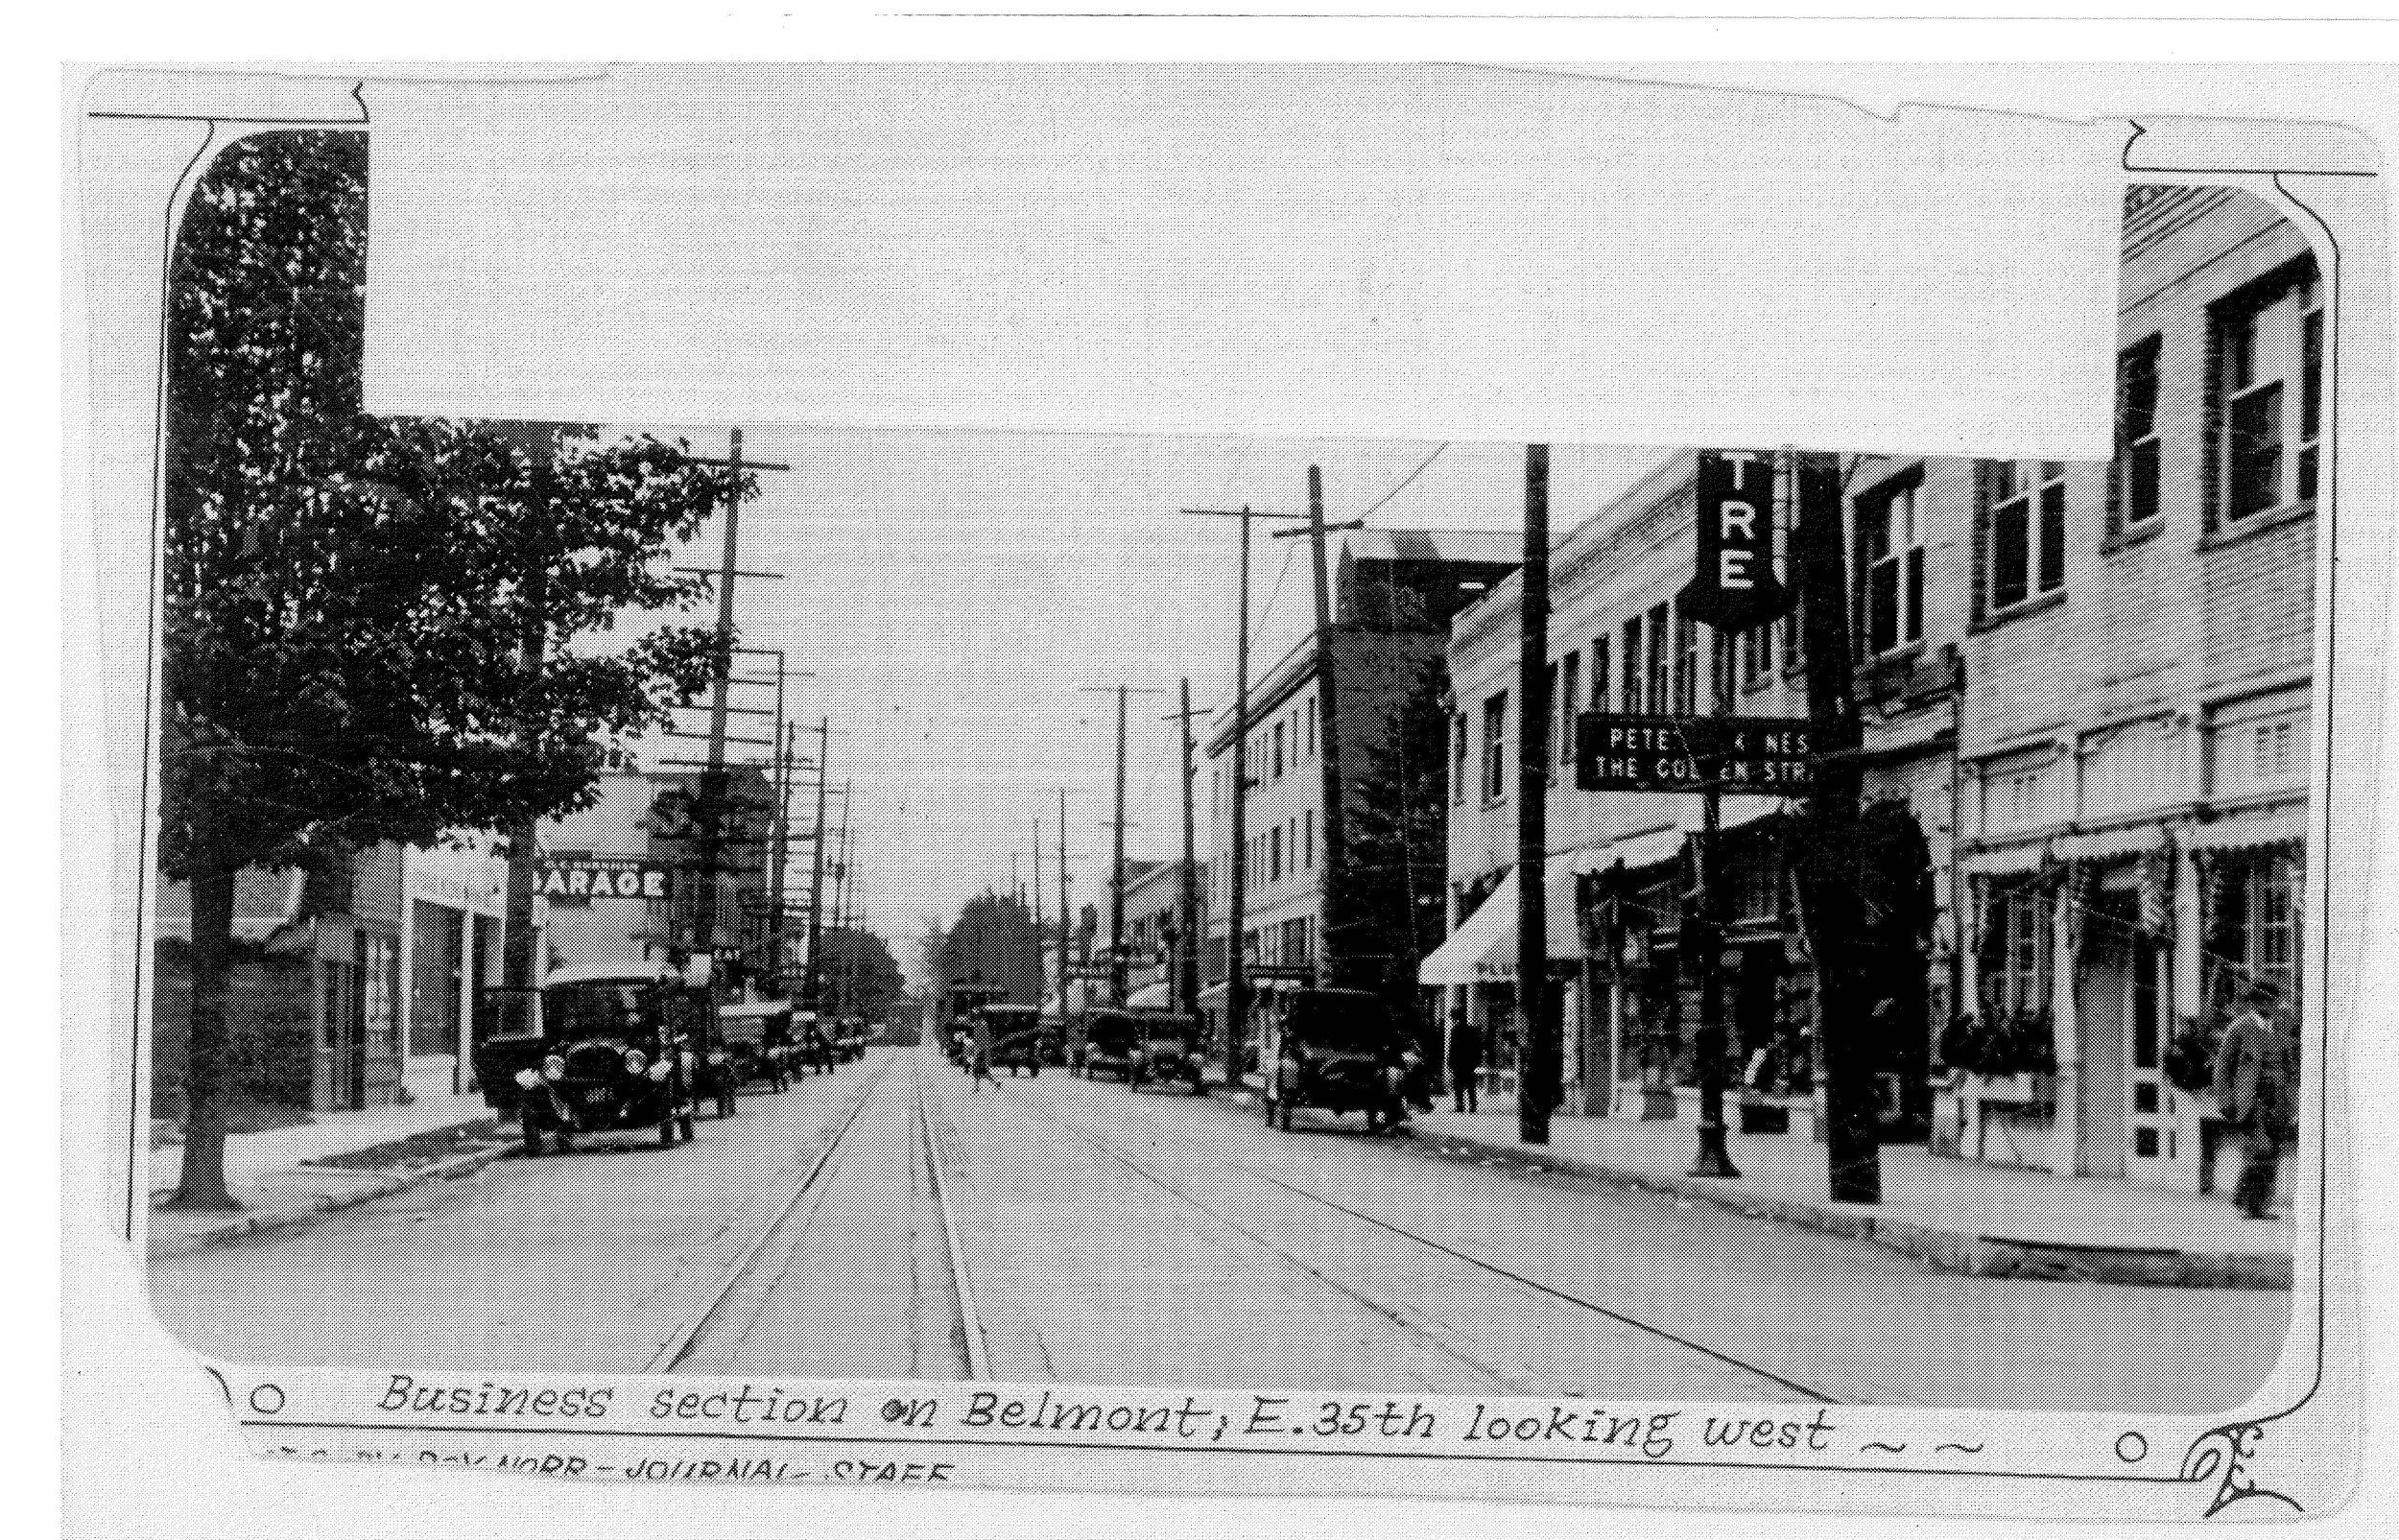 35th & Belmont, 1926